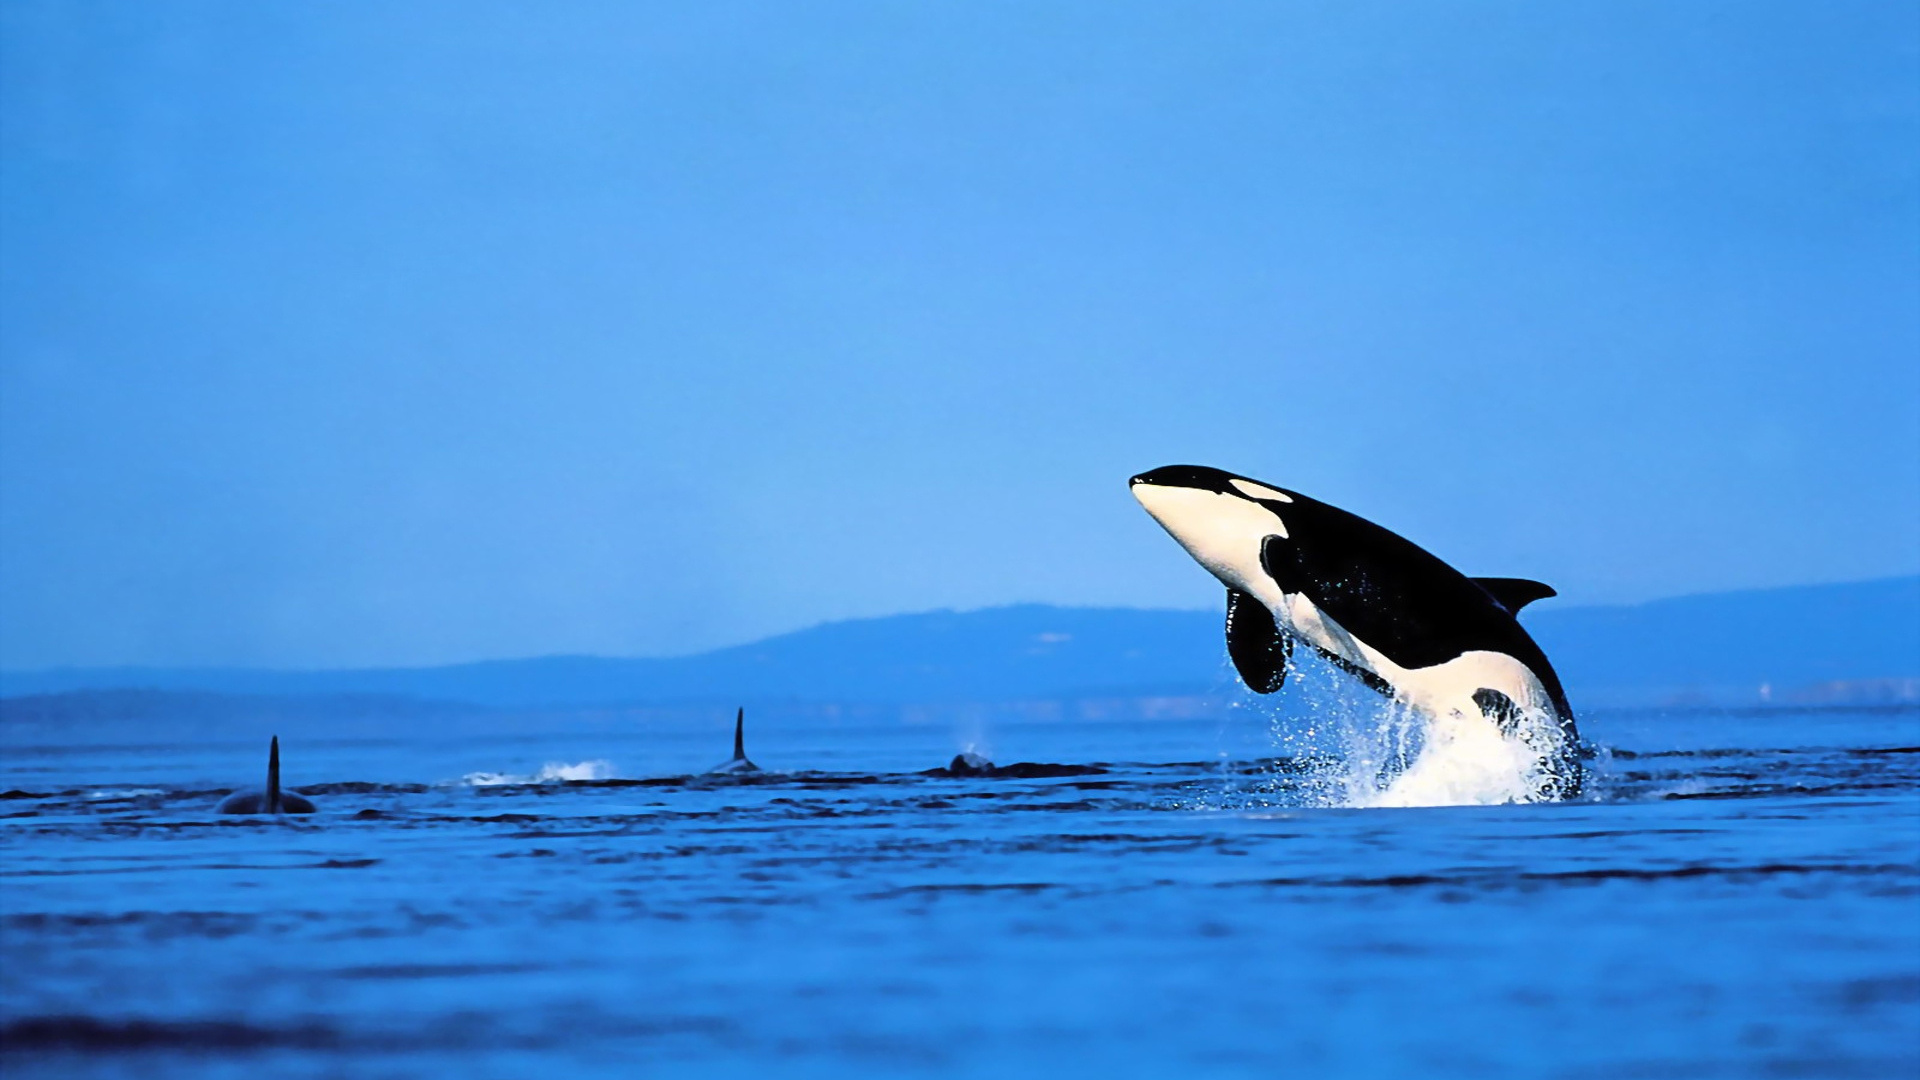 Killer Whales Wallpaper #145826 - Resolution 1920x1080 px